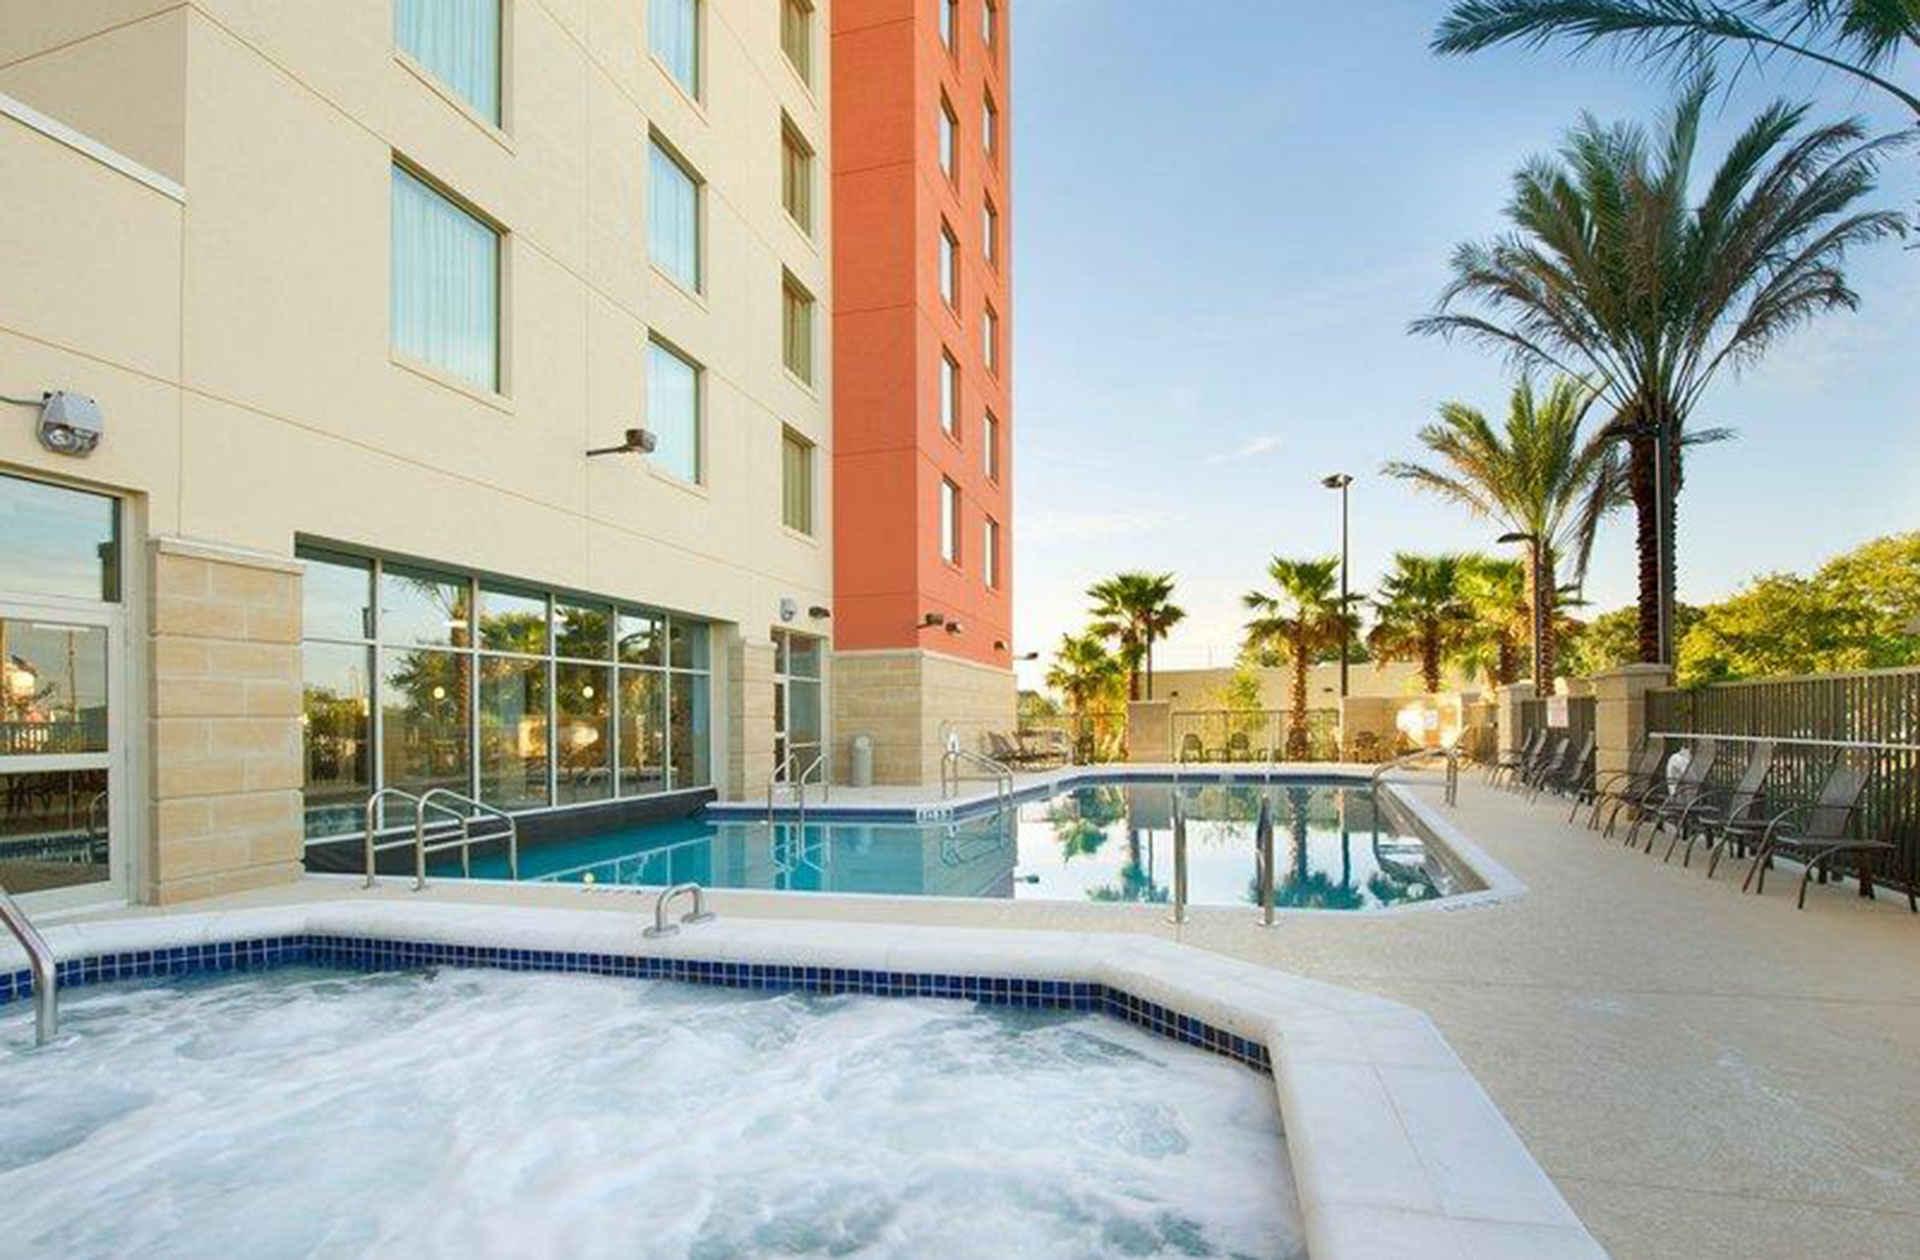 Drury Inn & Suites Near Universal Orlando Resort